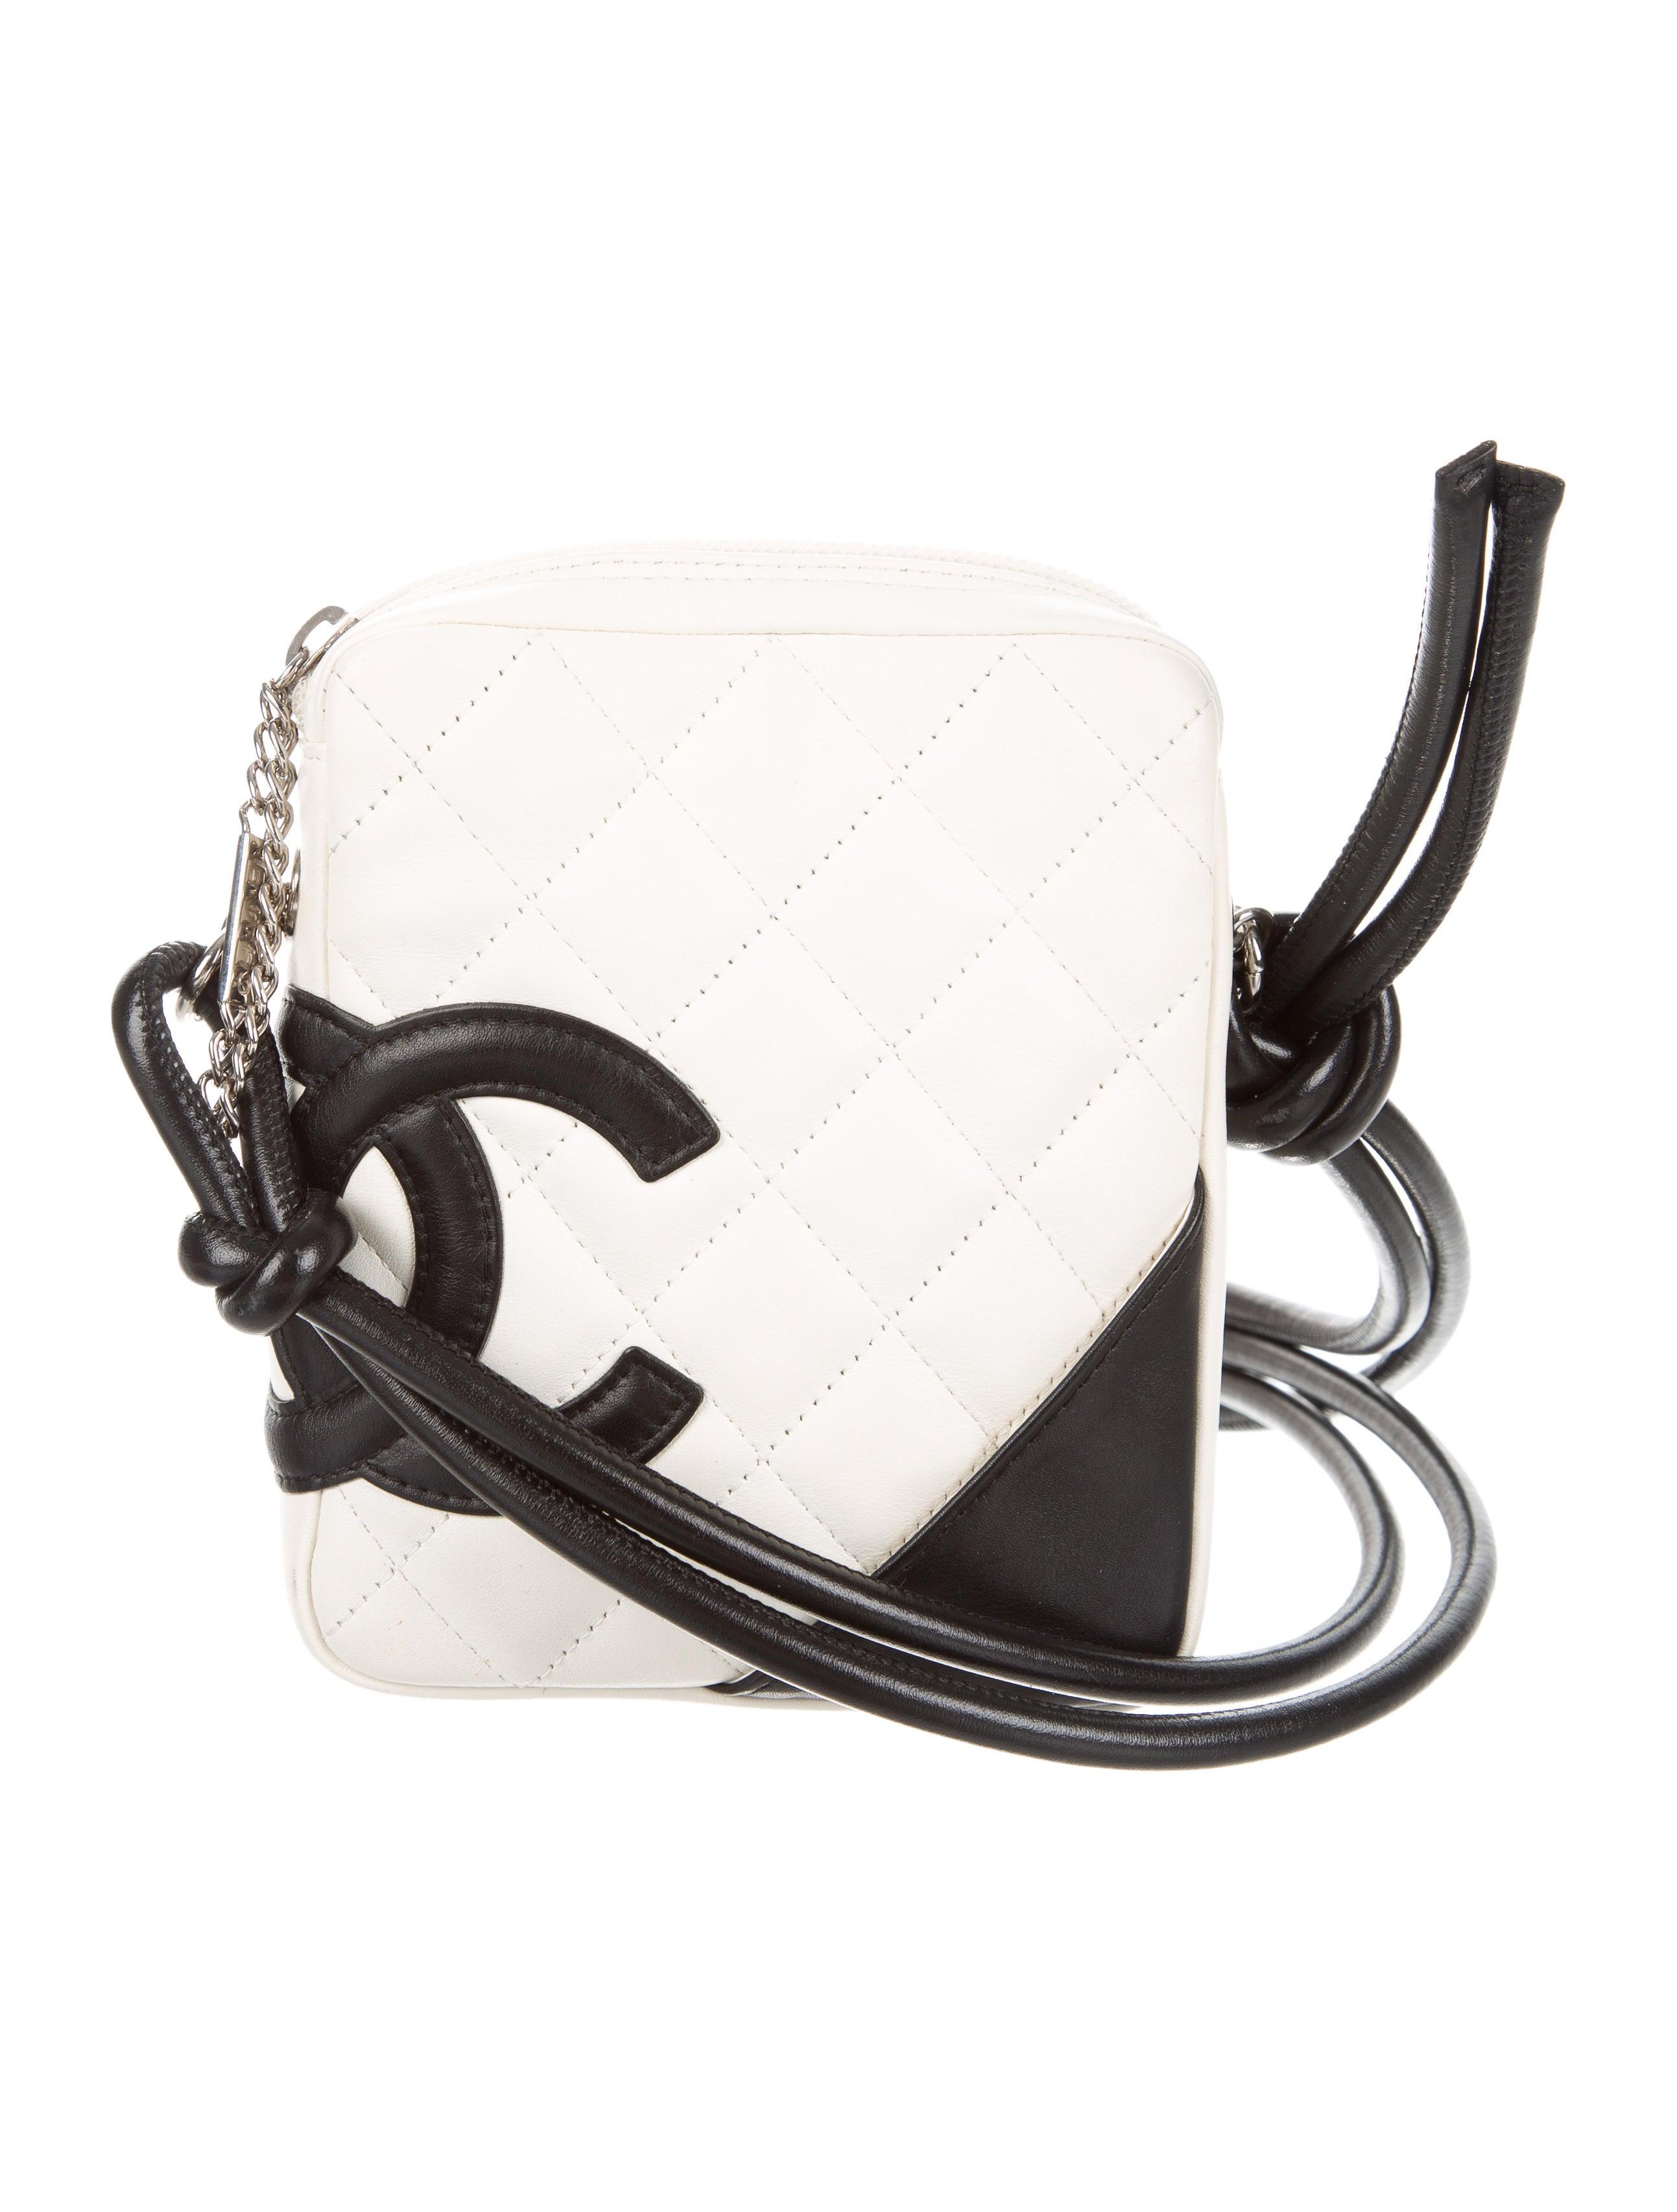 dc11a9363446a1 Chanel Ligne Cambon Crossbody Bag - Handbags - CHA224891 | The RealReal